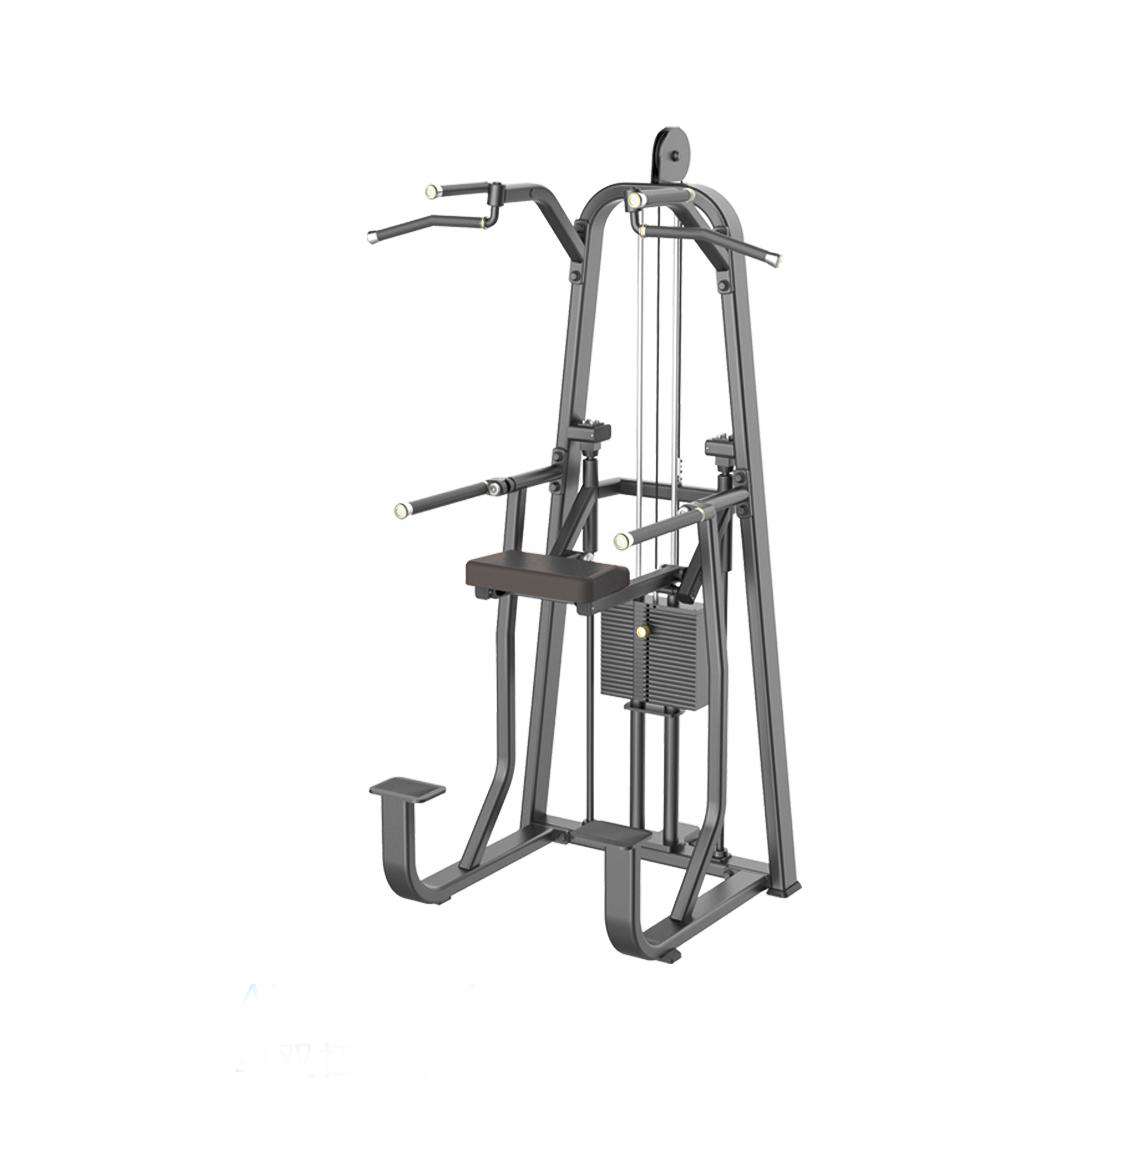 Тренажер GROME Fitness AXD5009A Гравитрон